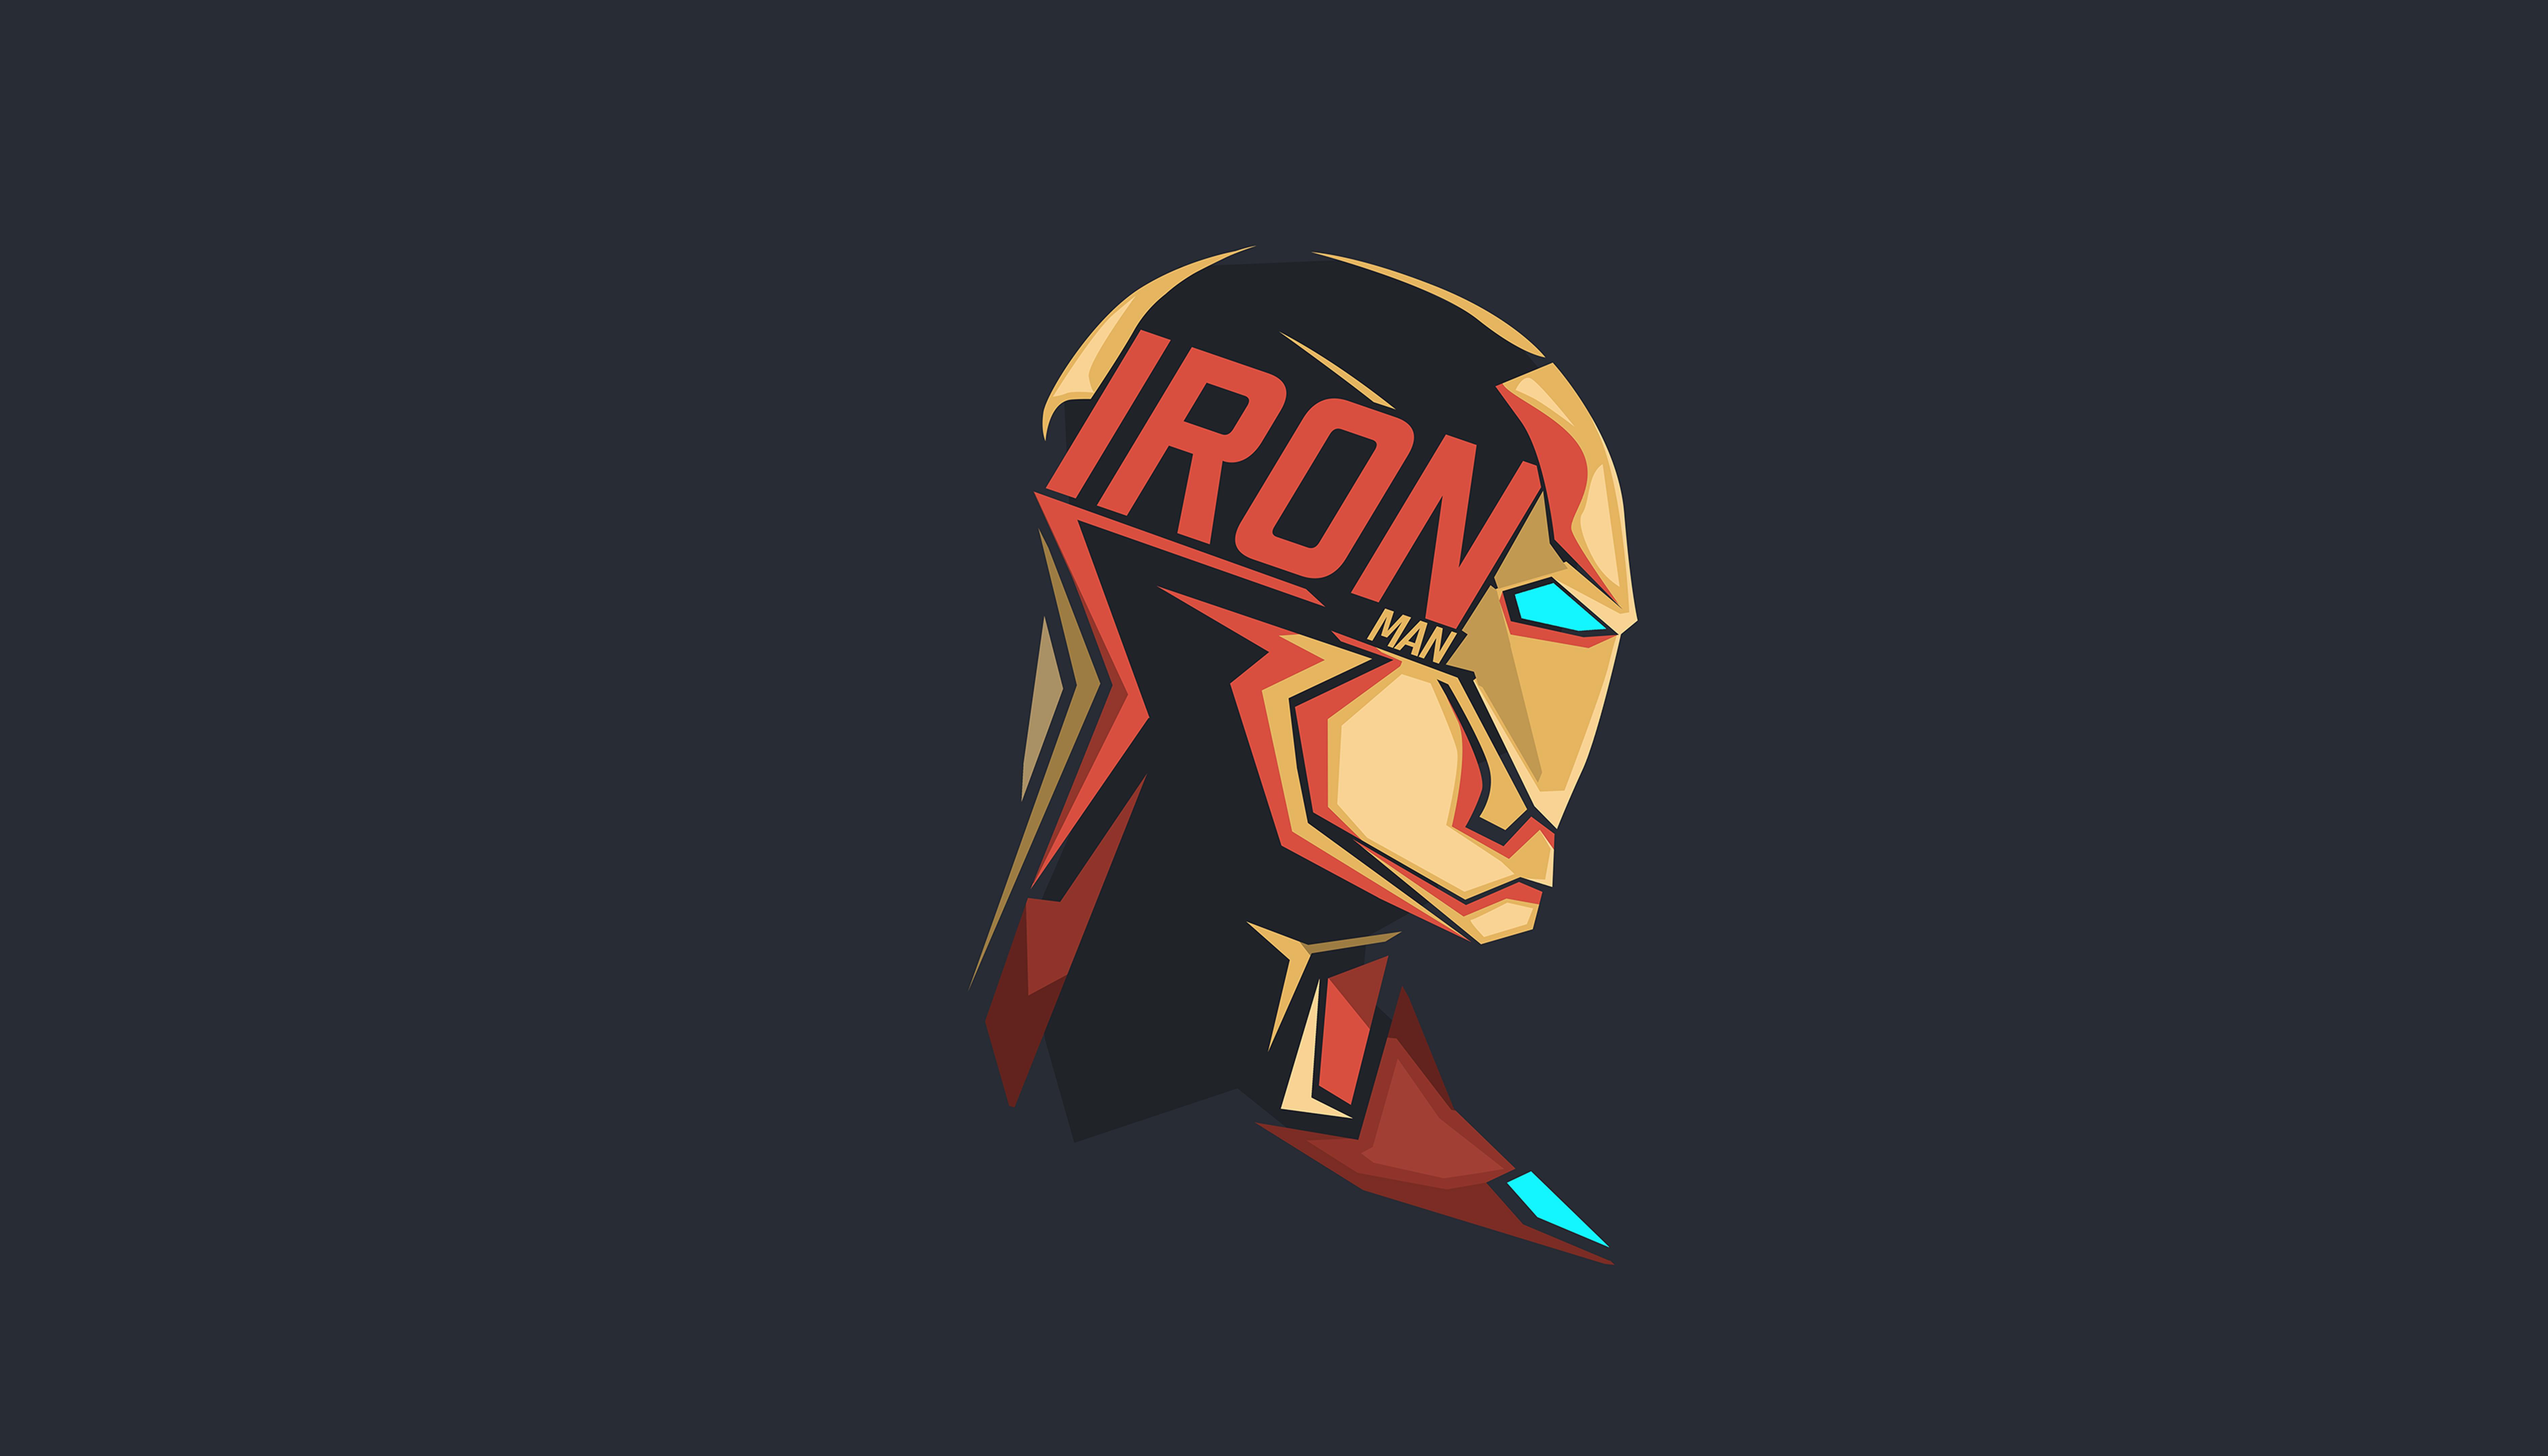 Iron man pop head minimalism 8k hd superheroes 4k - Iron man cartoon hd ...